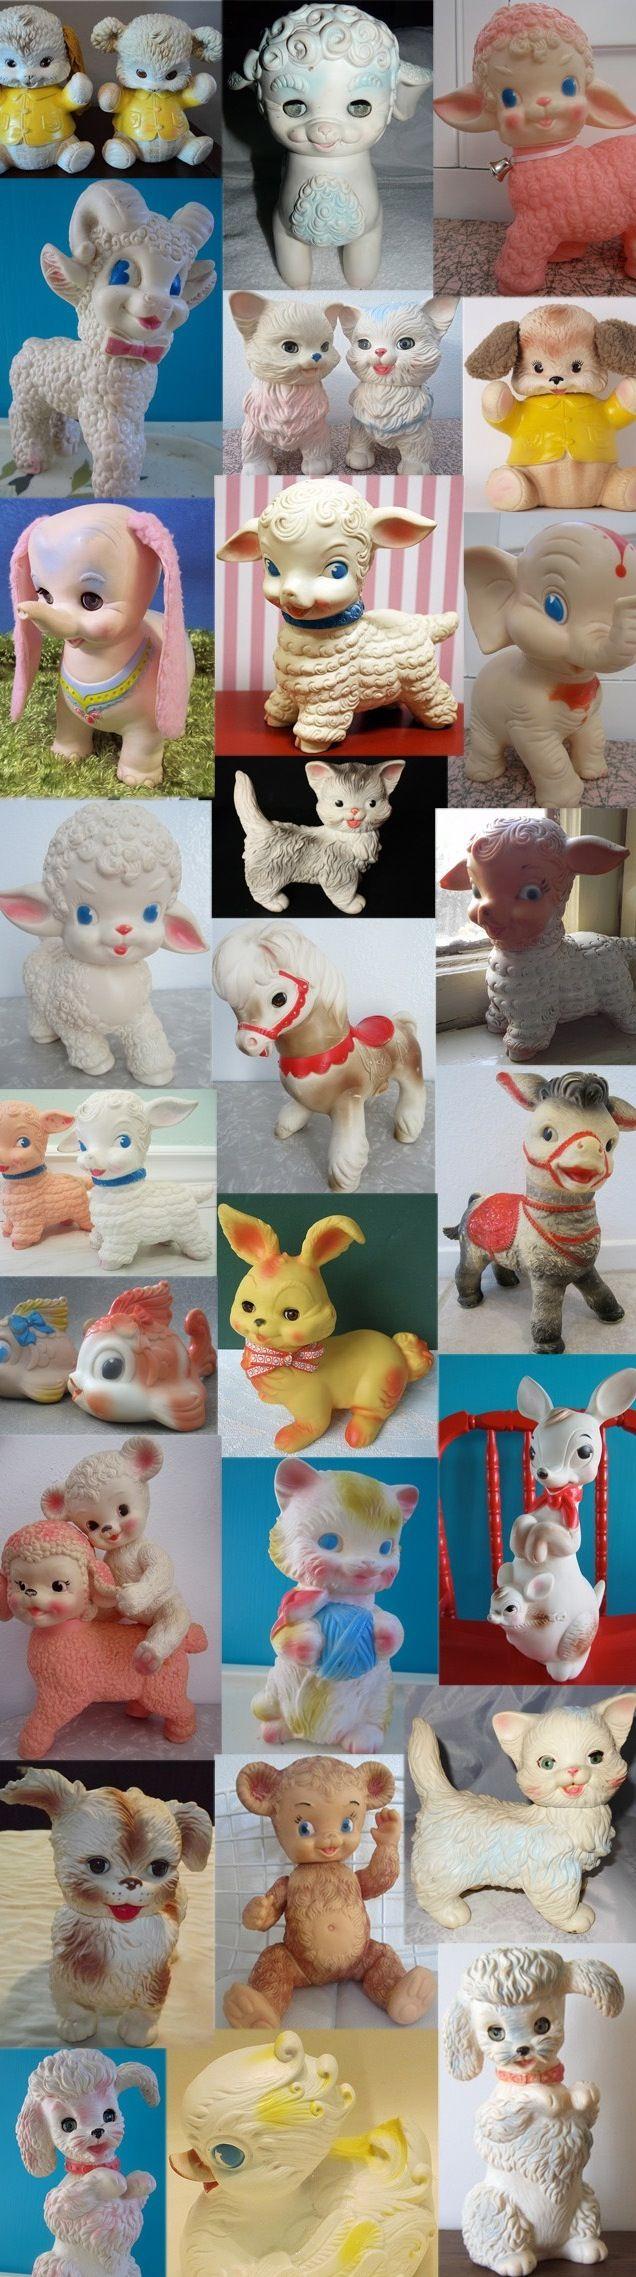 Vintage squeak toys. I still have my little lamb